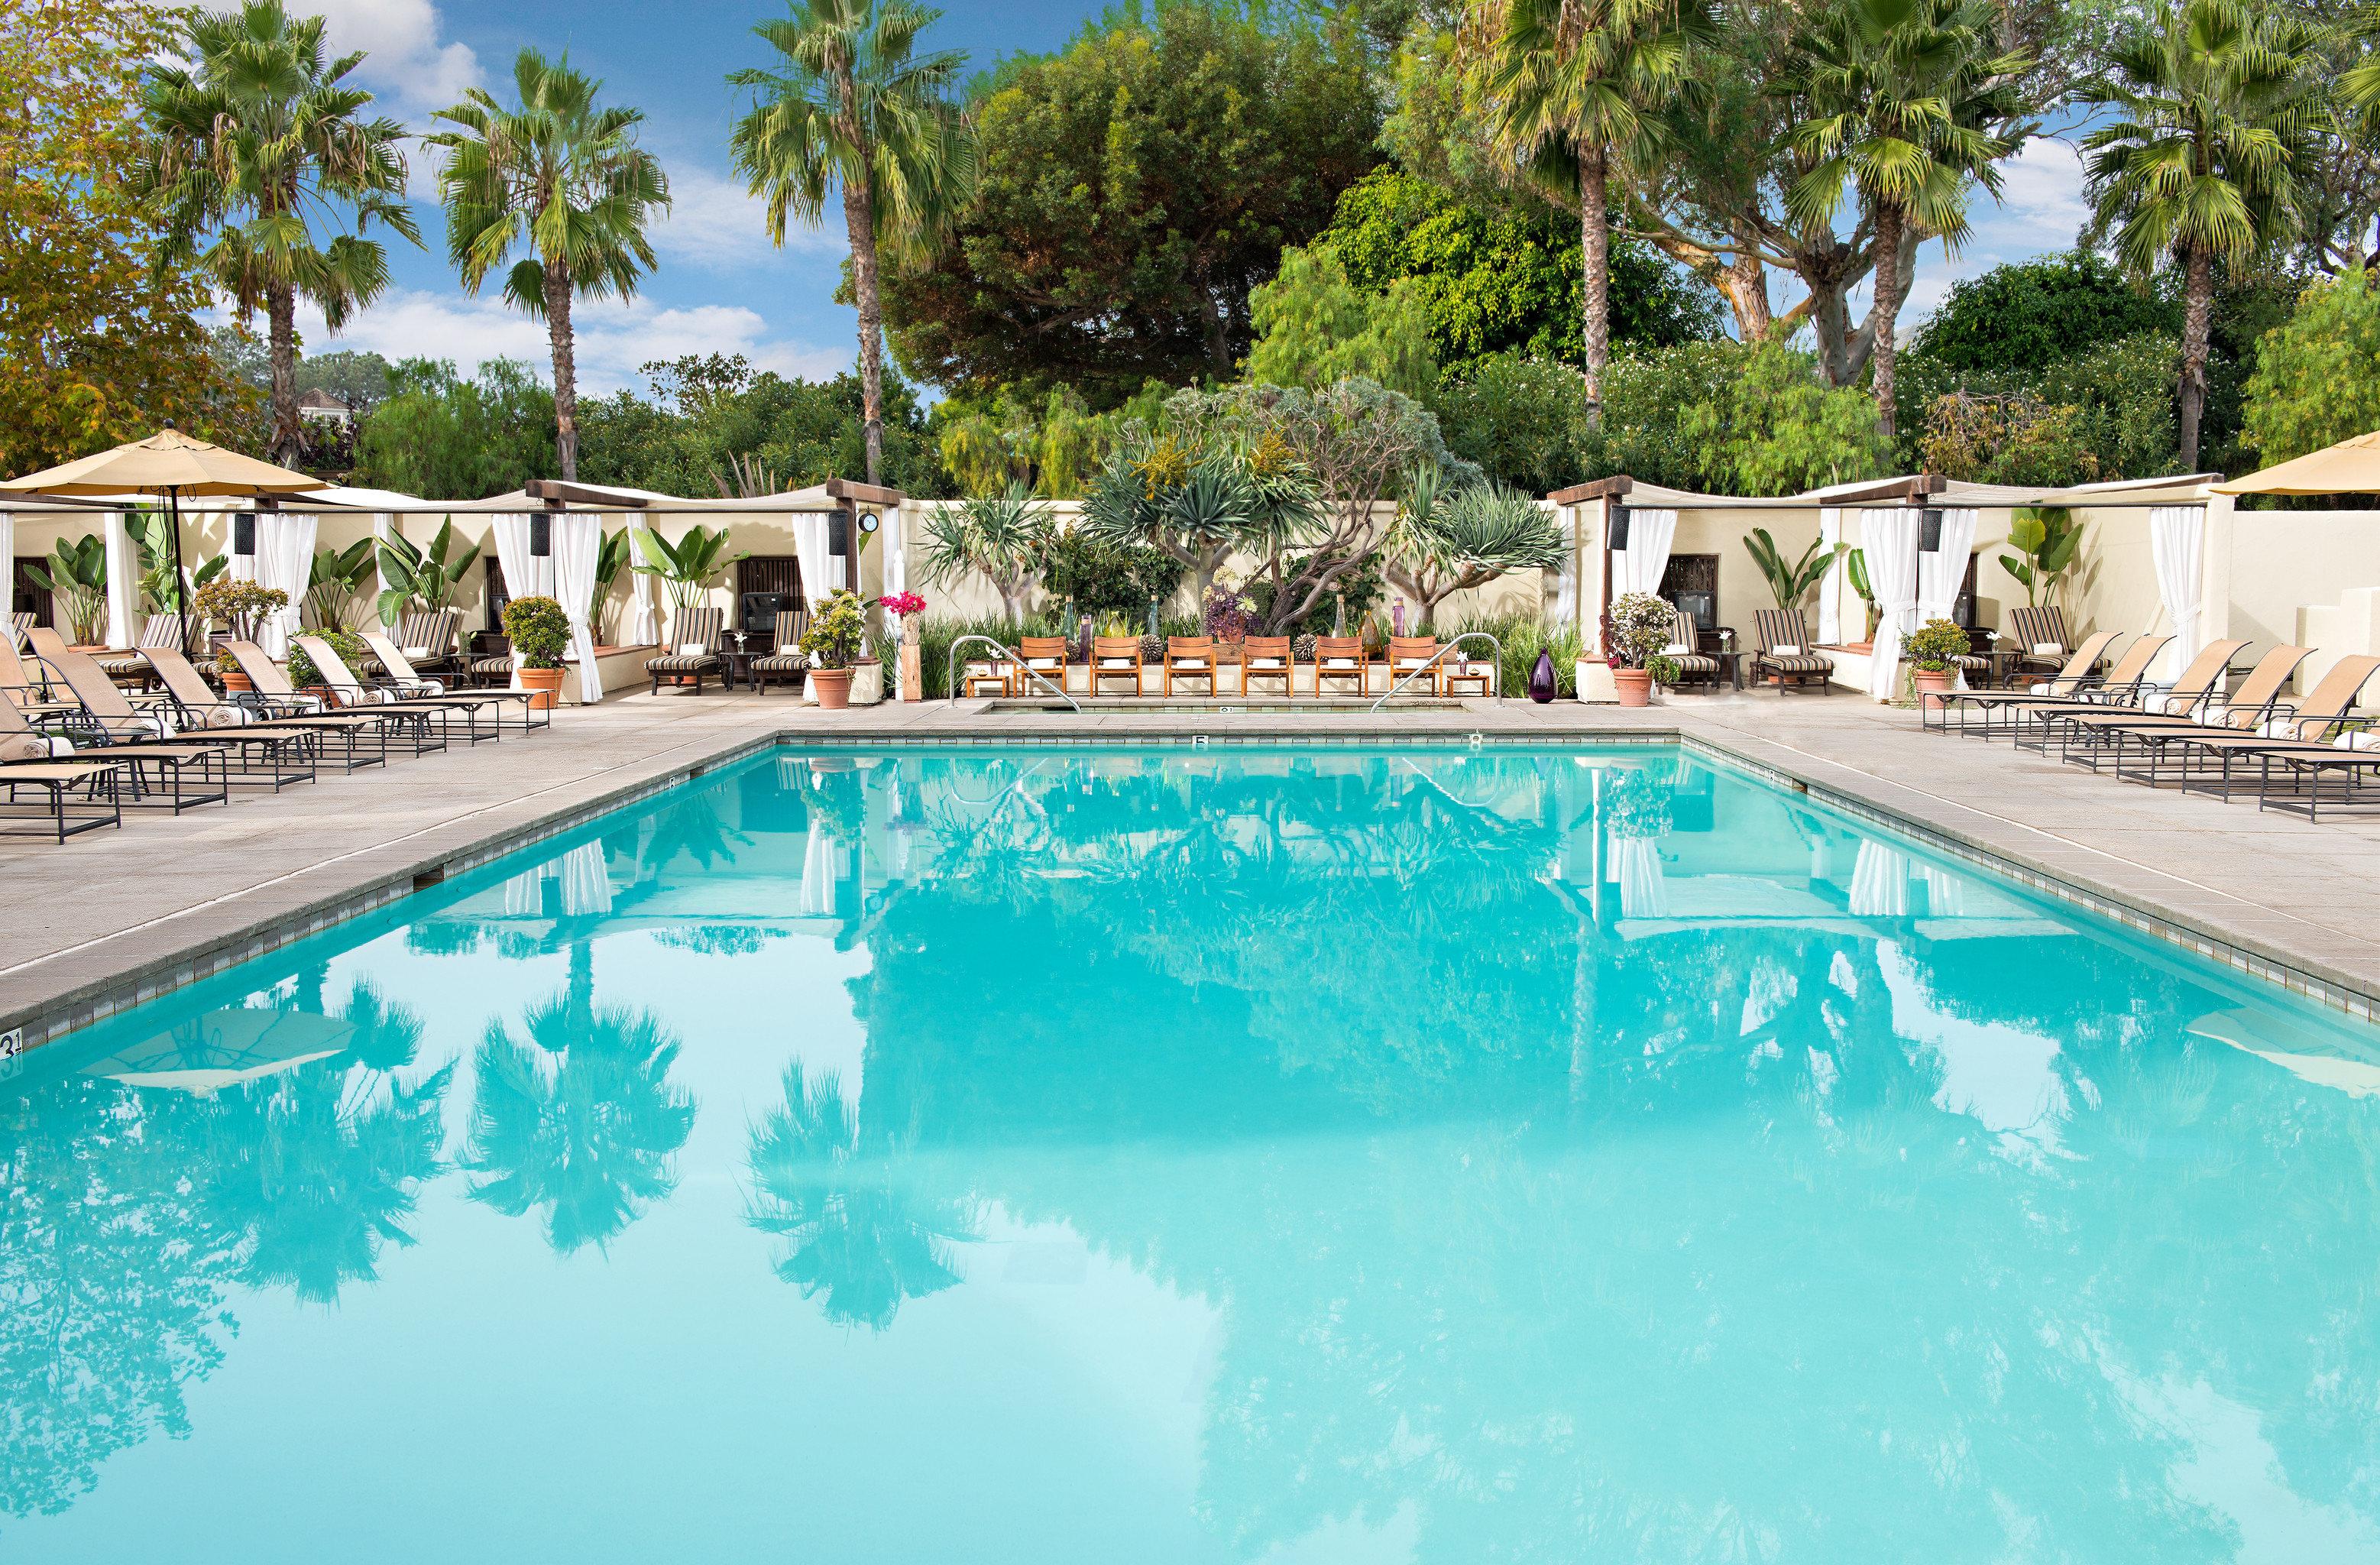 Exterior Hotels Pool Resort Trip Ideas tree outdoor swimming pool property leisure estate vacation Villa resort town backyard real estate swimming